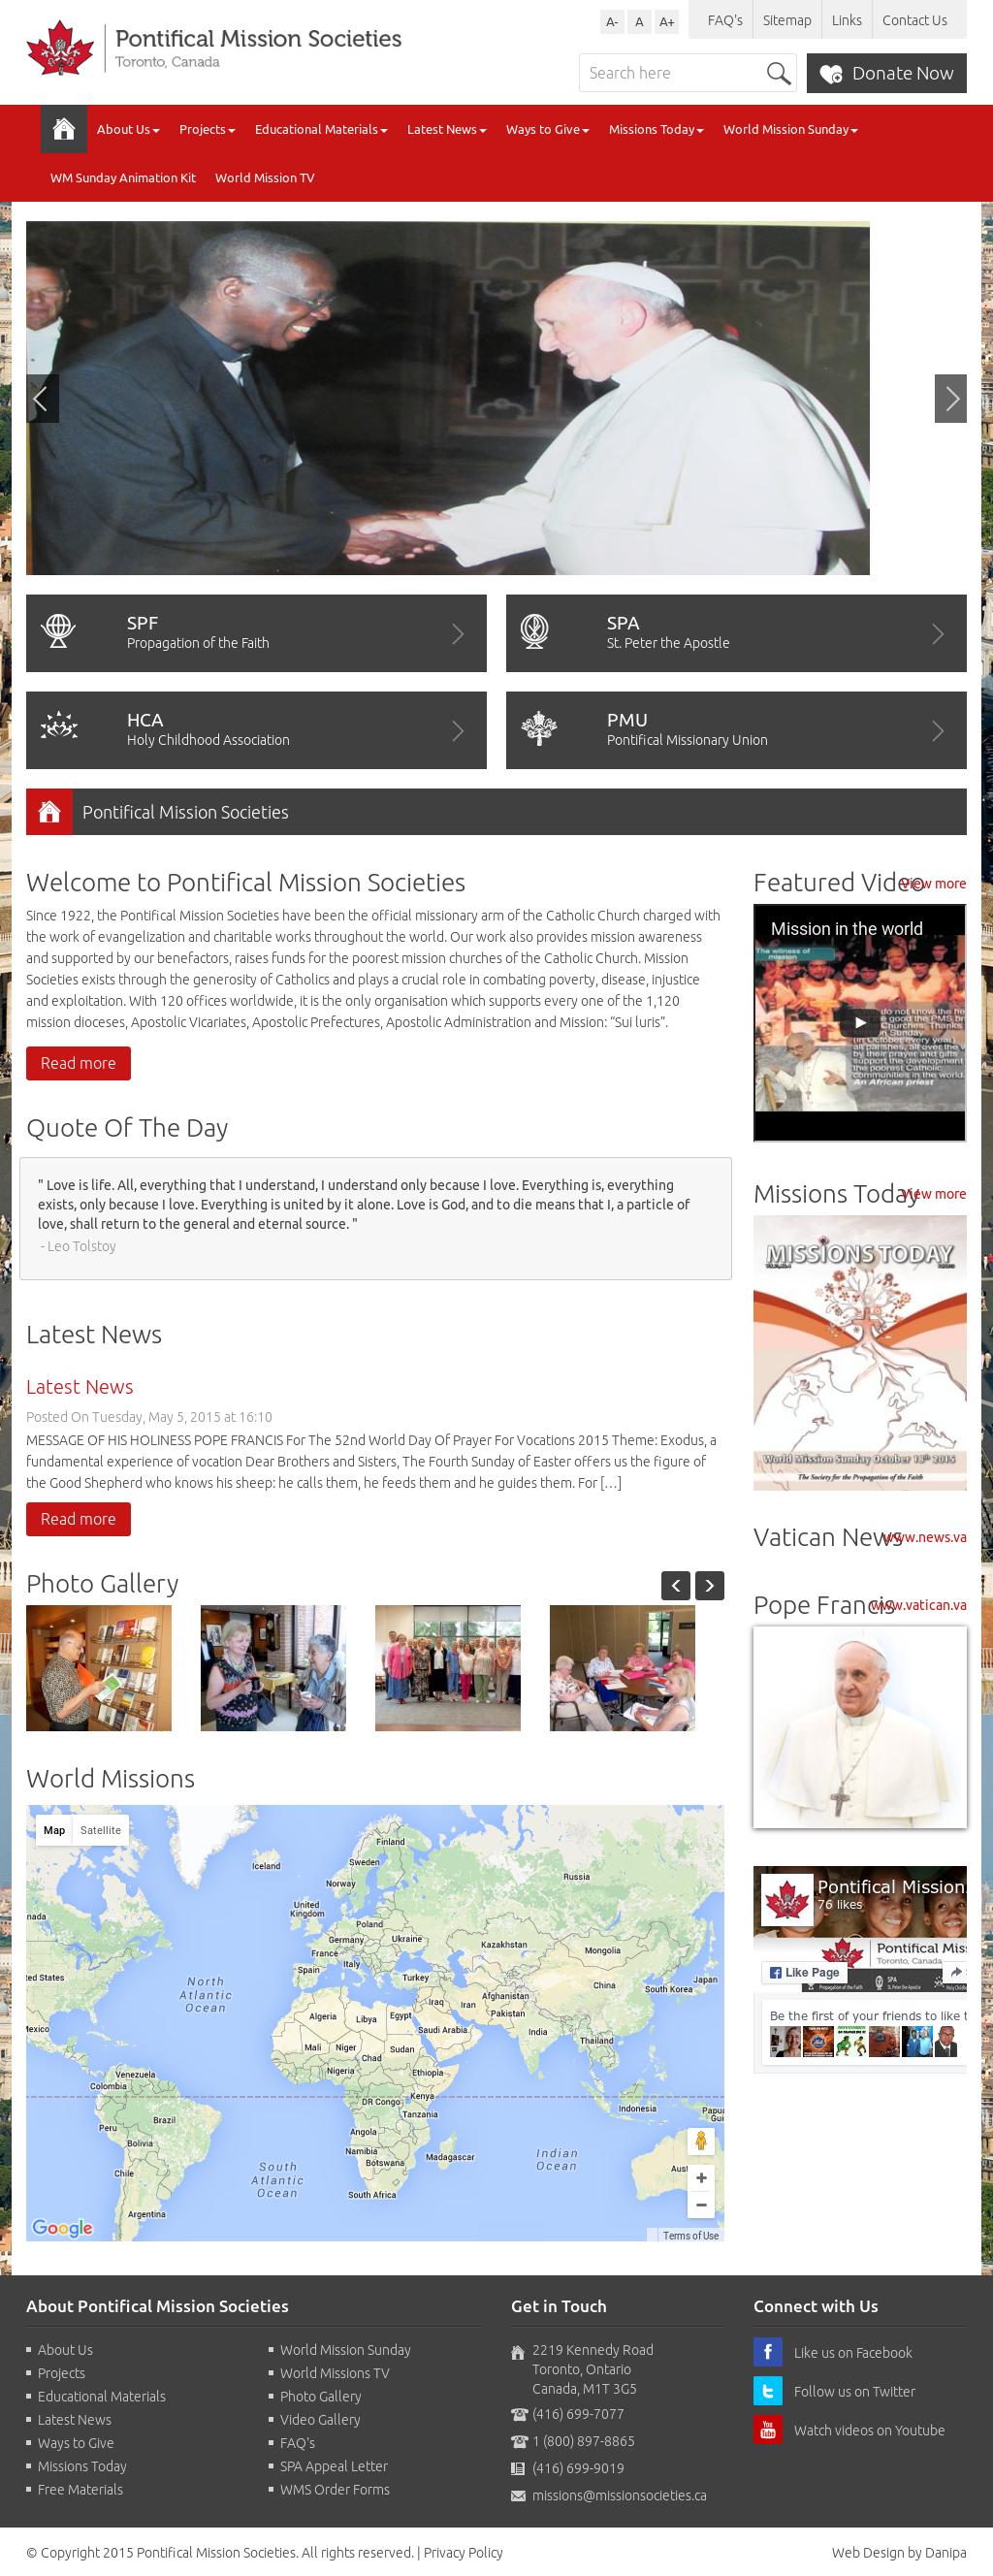 Pontifical Mission Societies - Toronto, Canada Competitors